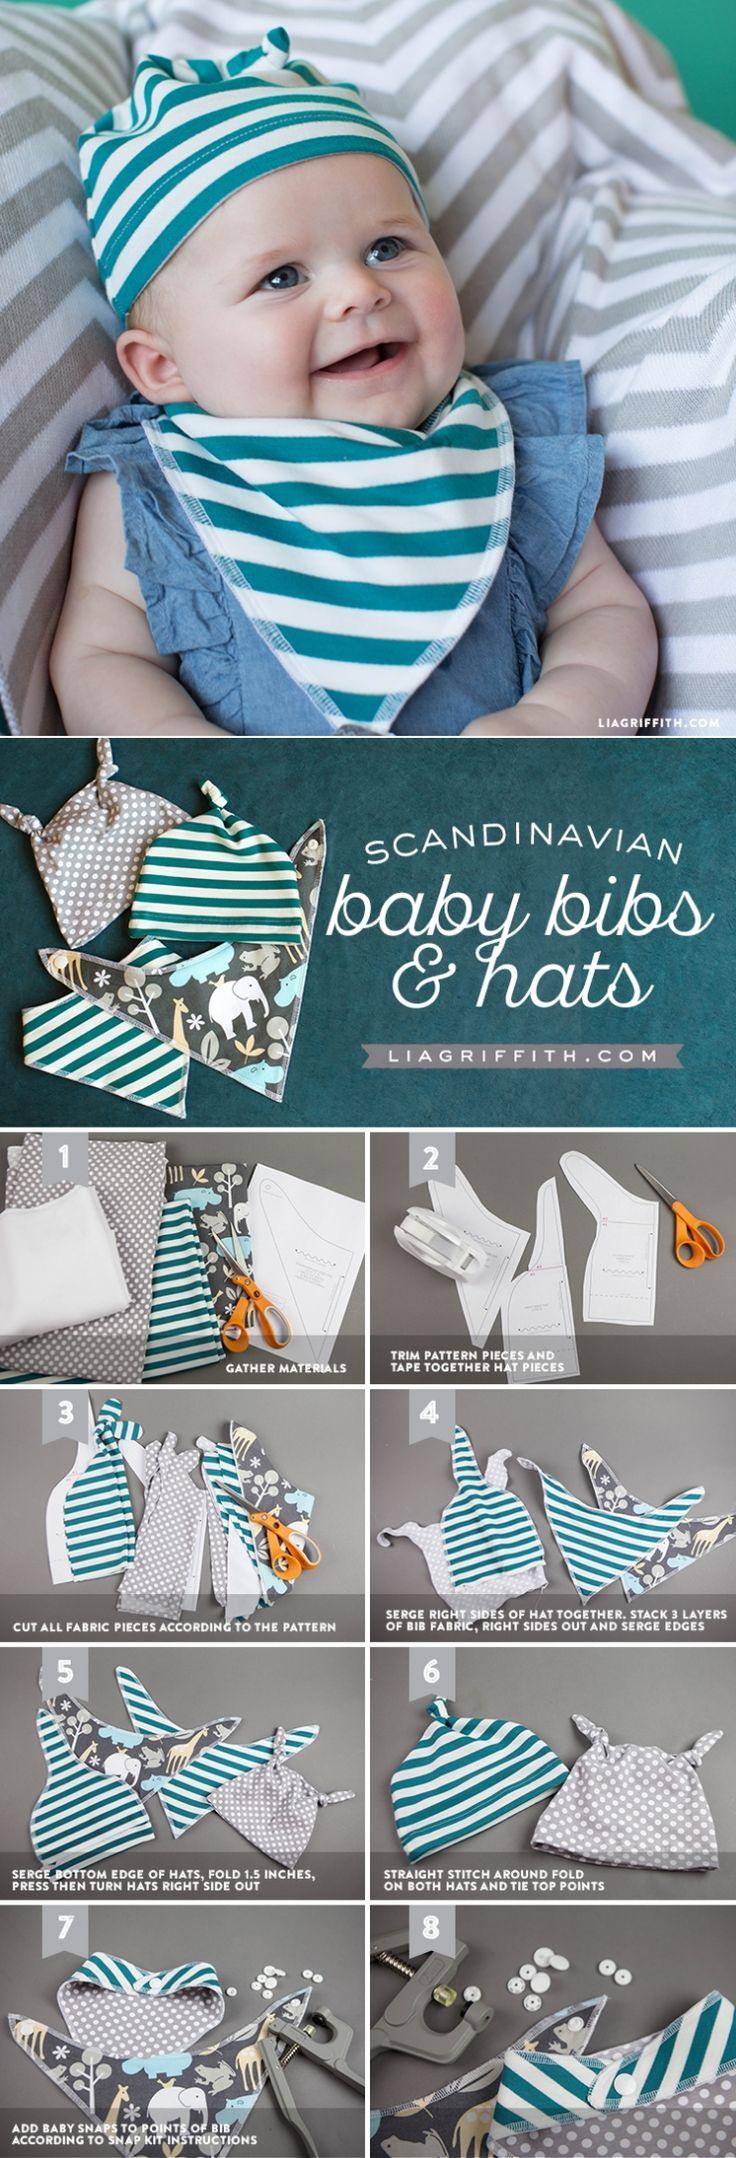 DIY Baby Bib and Hat - www.LiaGriffith.com - #fabricdotcom #sewingproject #sewingpattern #babybibpattern #babybib #diybabybib #diybaby #babydiy